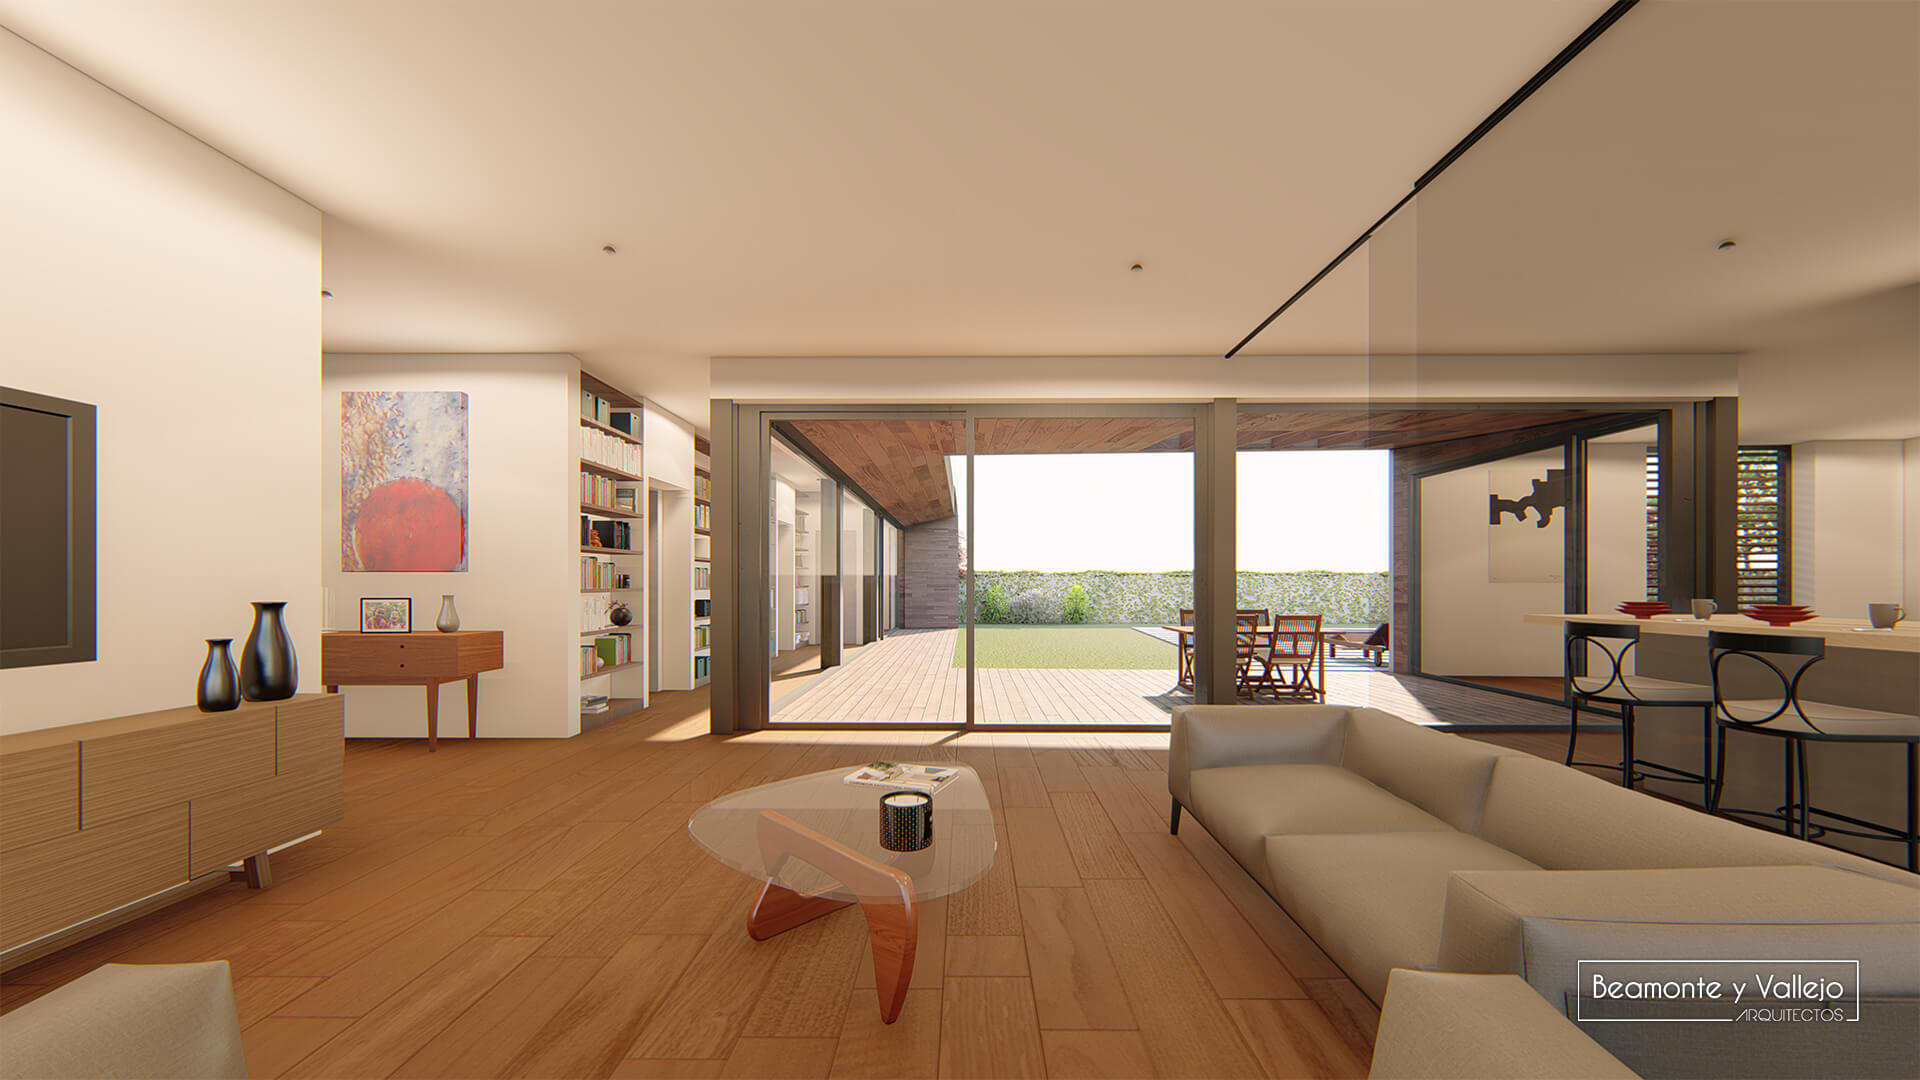 Beamonte y Vallejo arquitectos - Passivhaus Utebo - 1